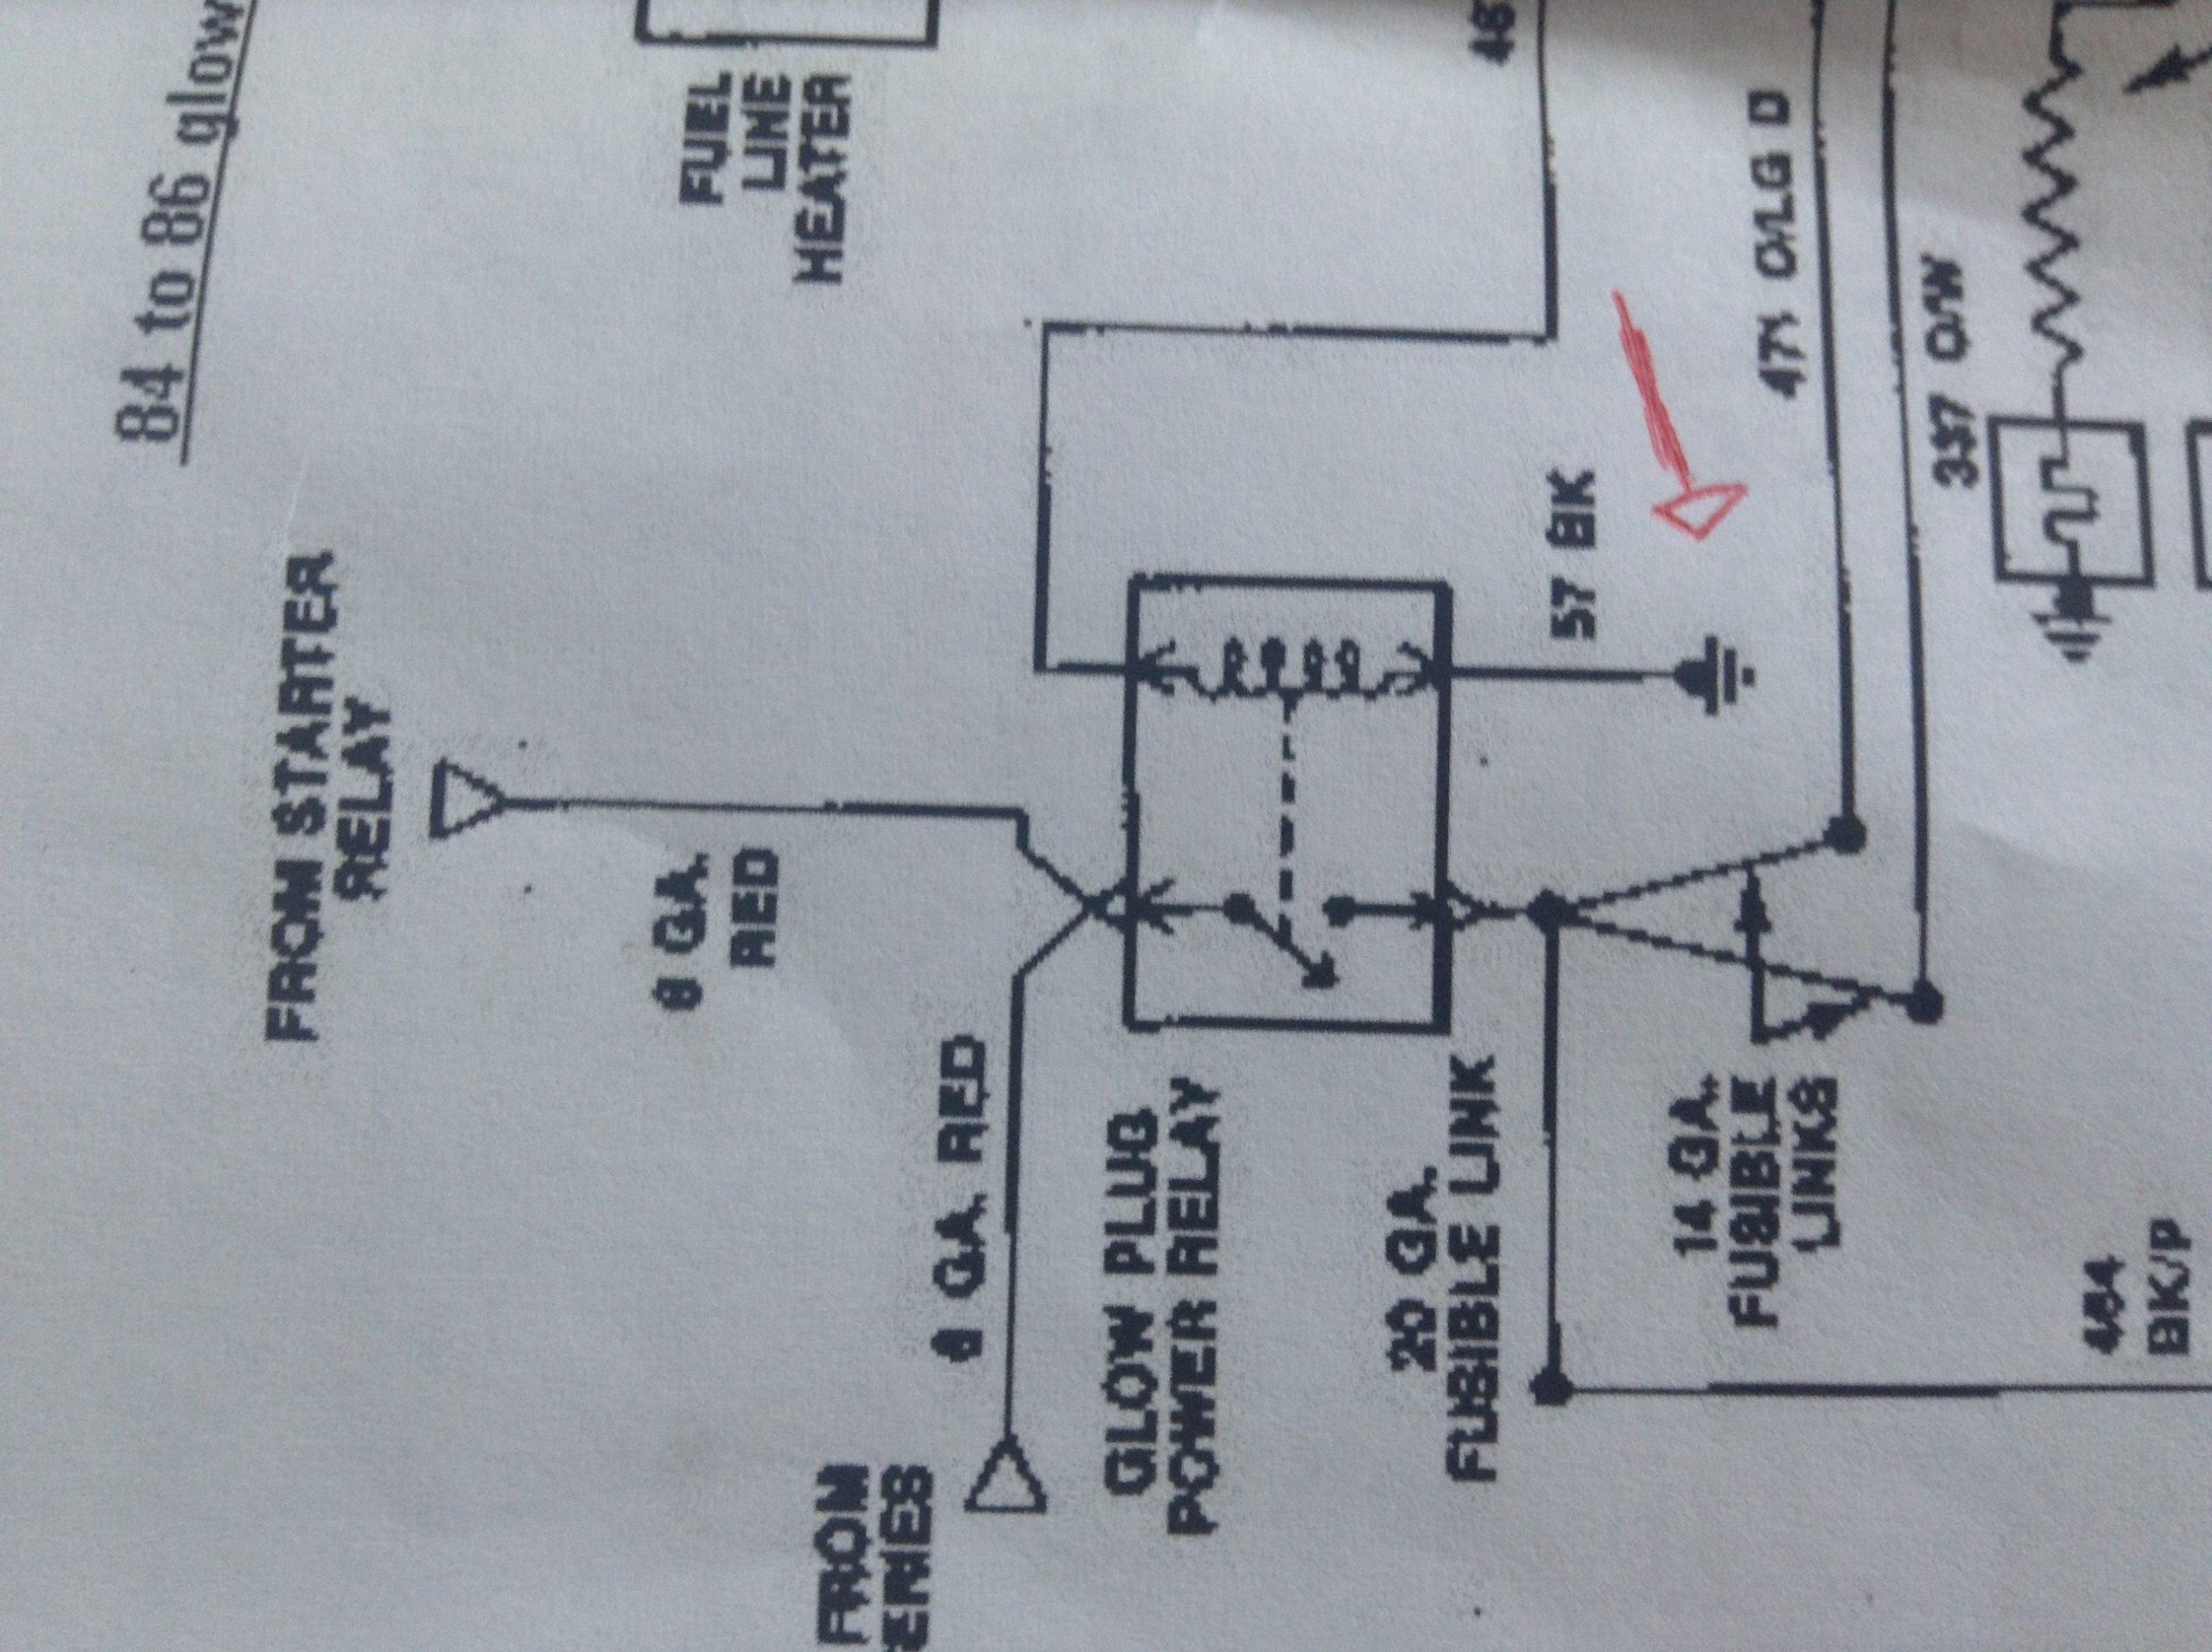 glow plug relay wiring easy one